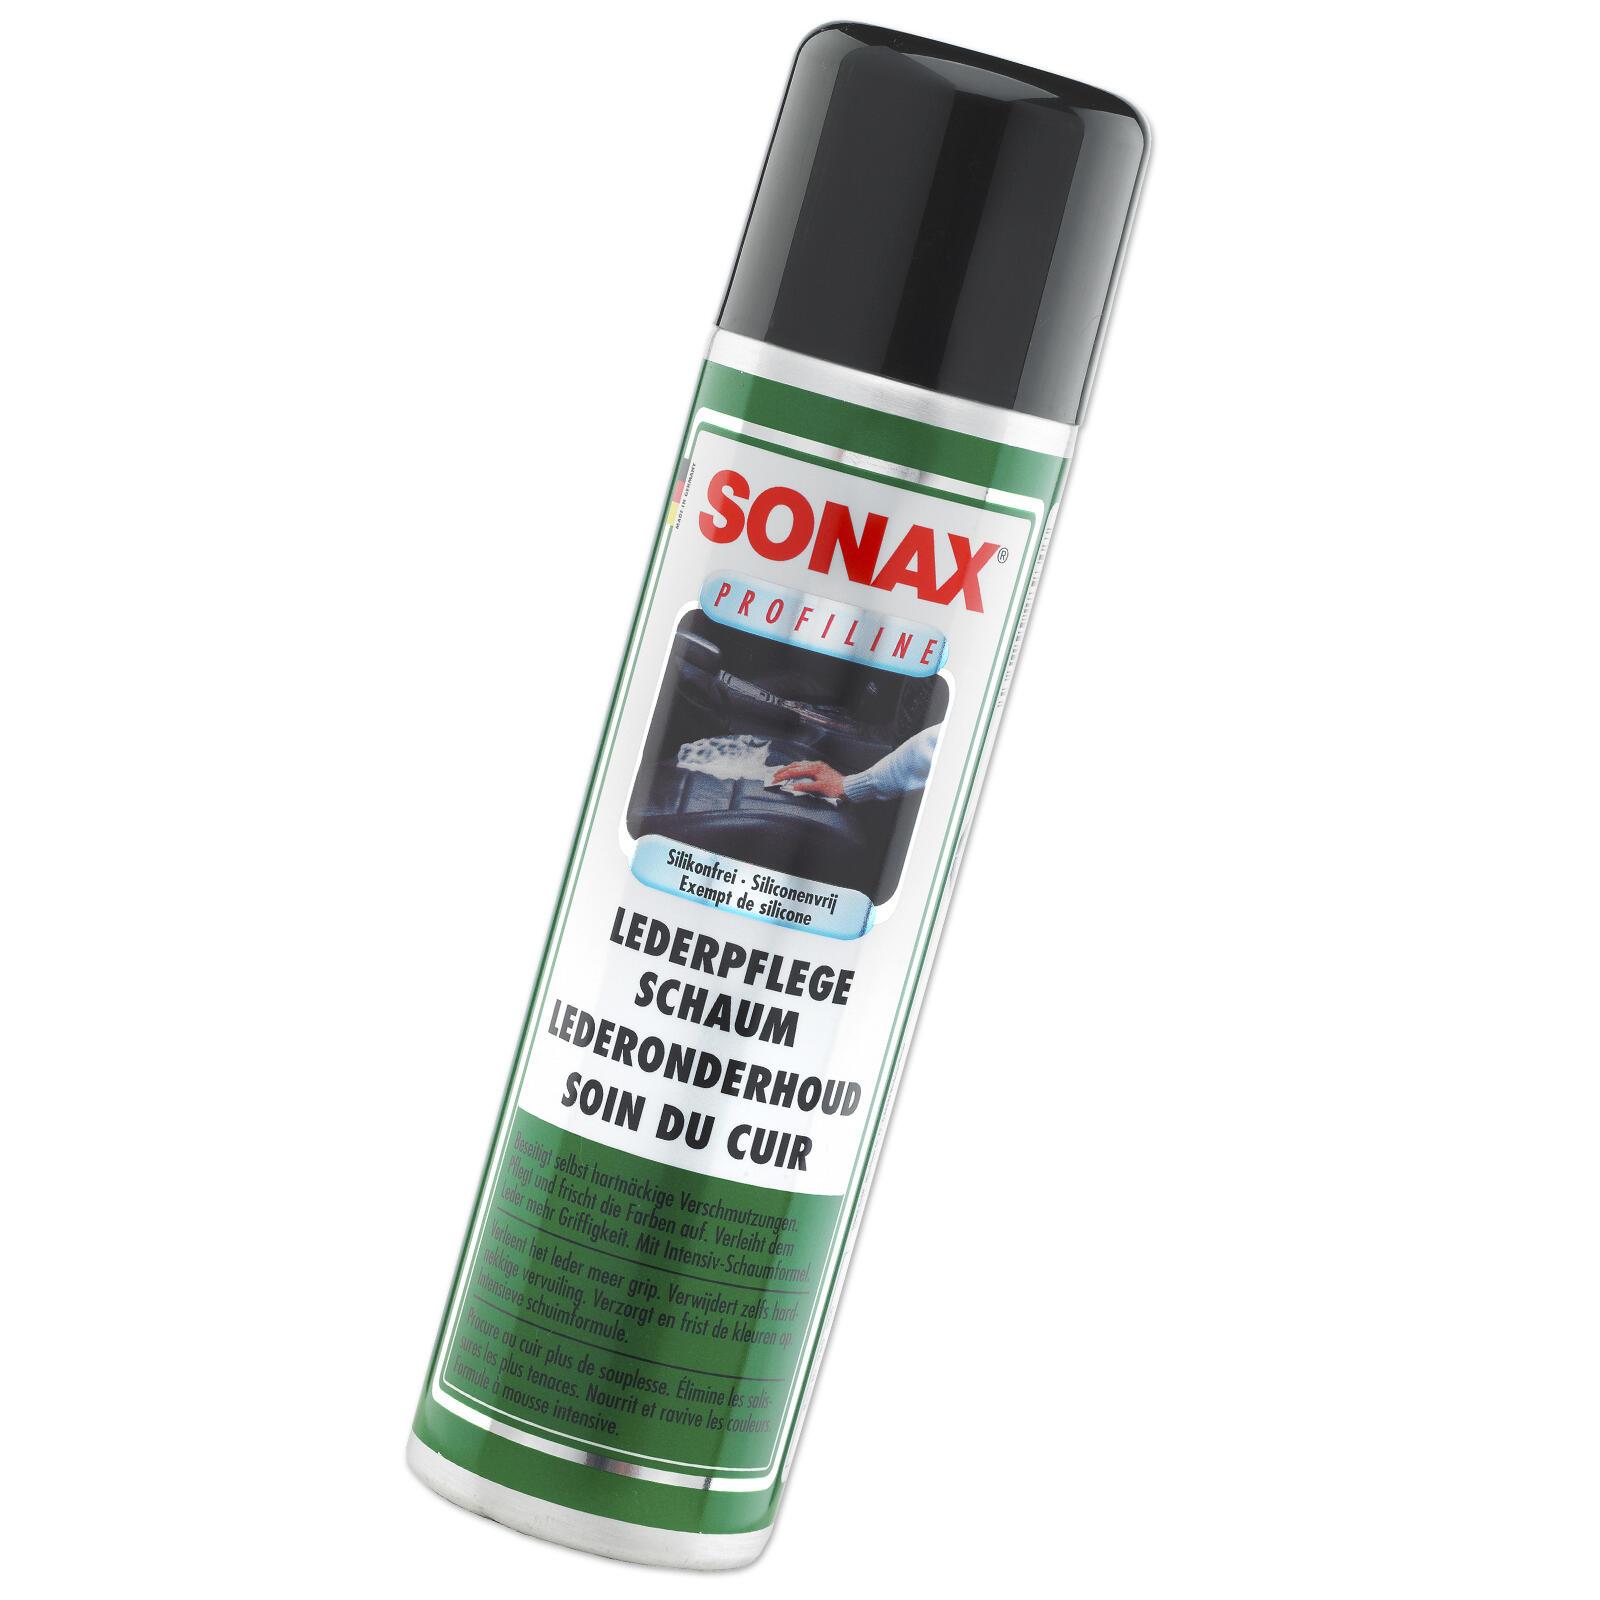 SONAX PROFILINE LederPflegeSchaum 400ml